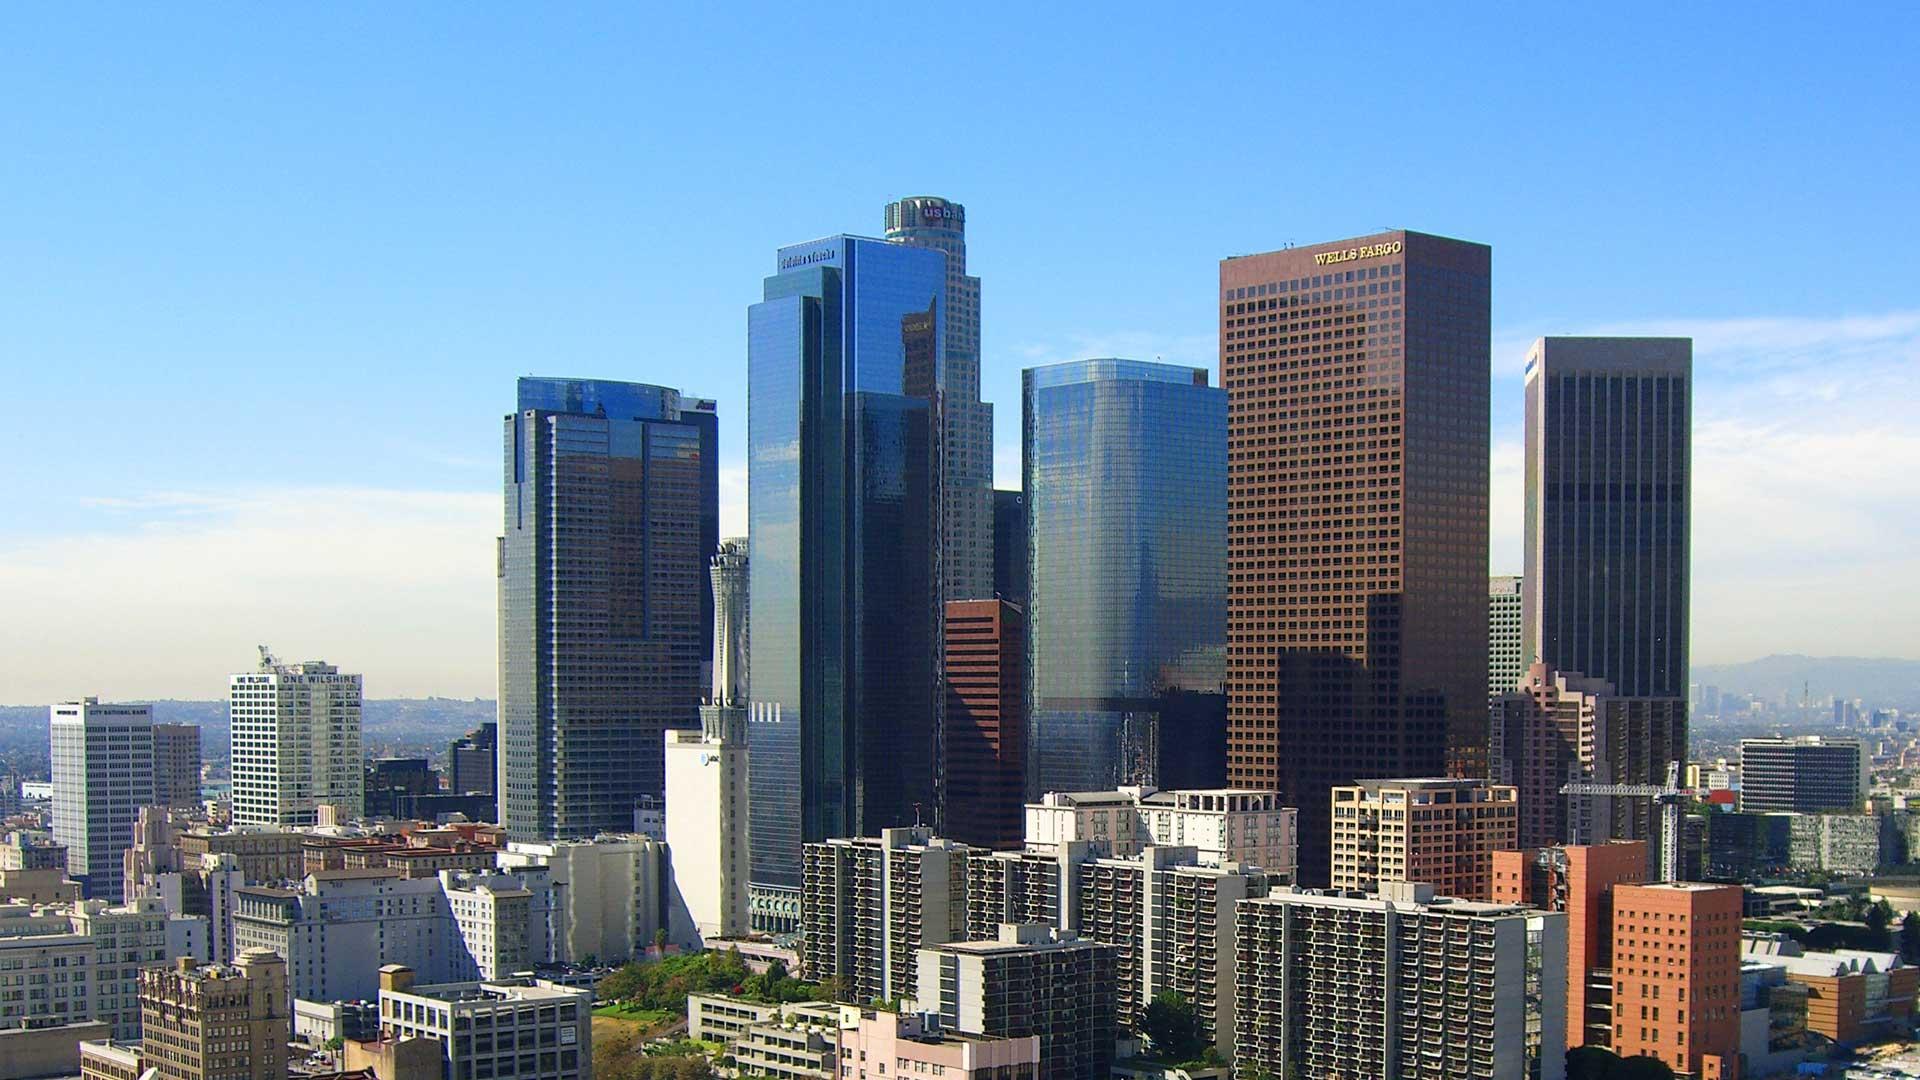 Downtown_LA_Skyscrapers